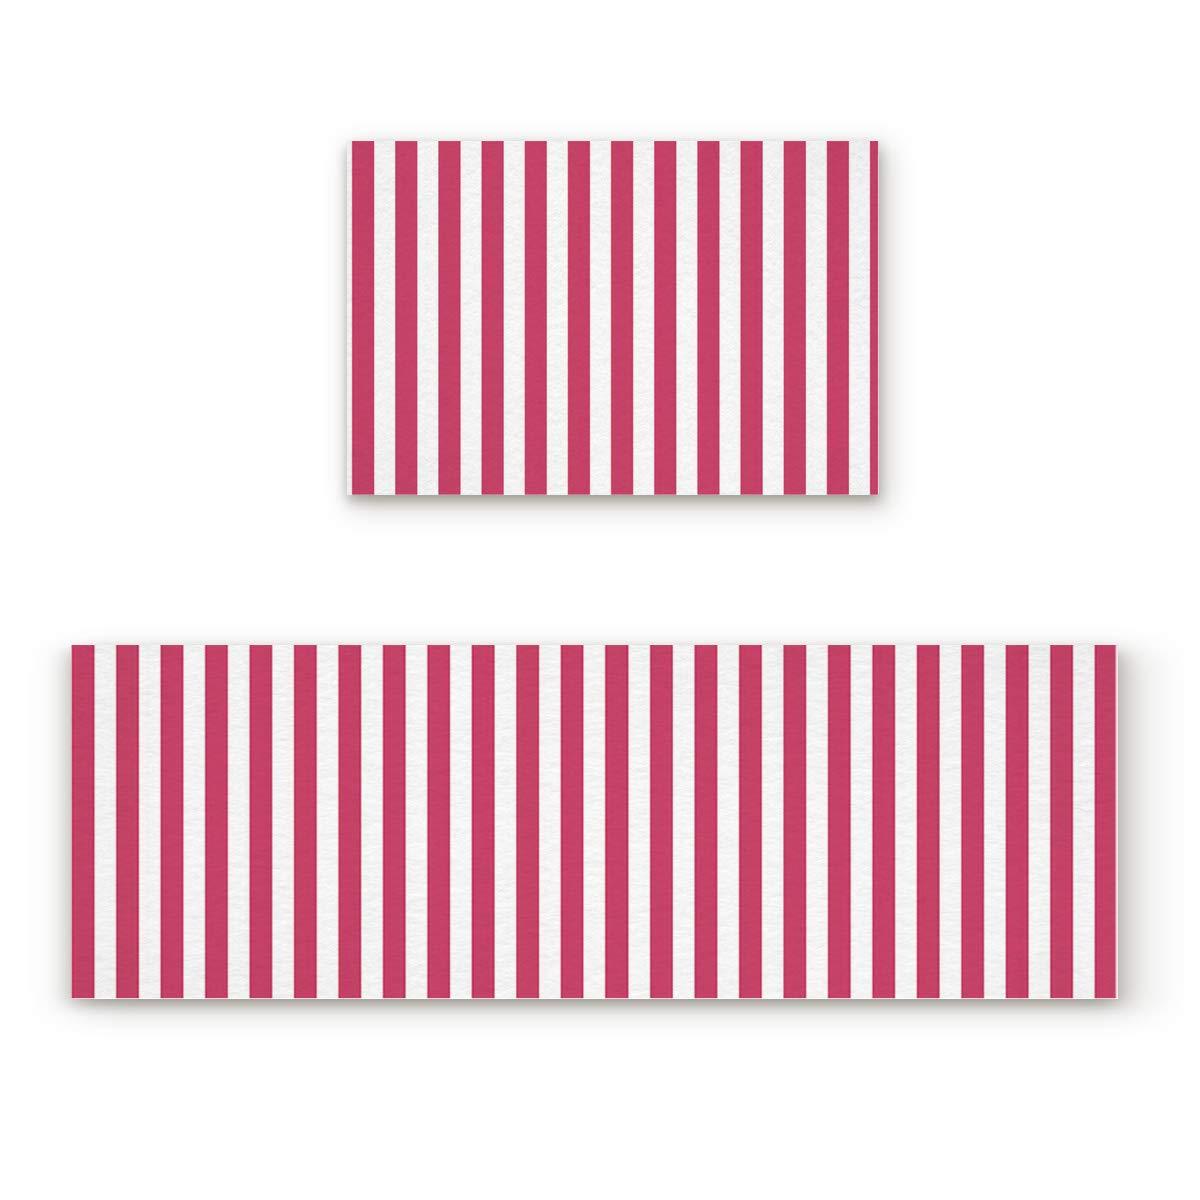 Stripe40FIY7615 23.6x35.4In+23.6x70.9In Findamy Non-Slip Indoor Door Mat Entrance Rug Rectangle Absorbent Moisture Floor Carpet for White and Red Stripe Pattern Doormat 23.6x35.4In+23.6x70.9In